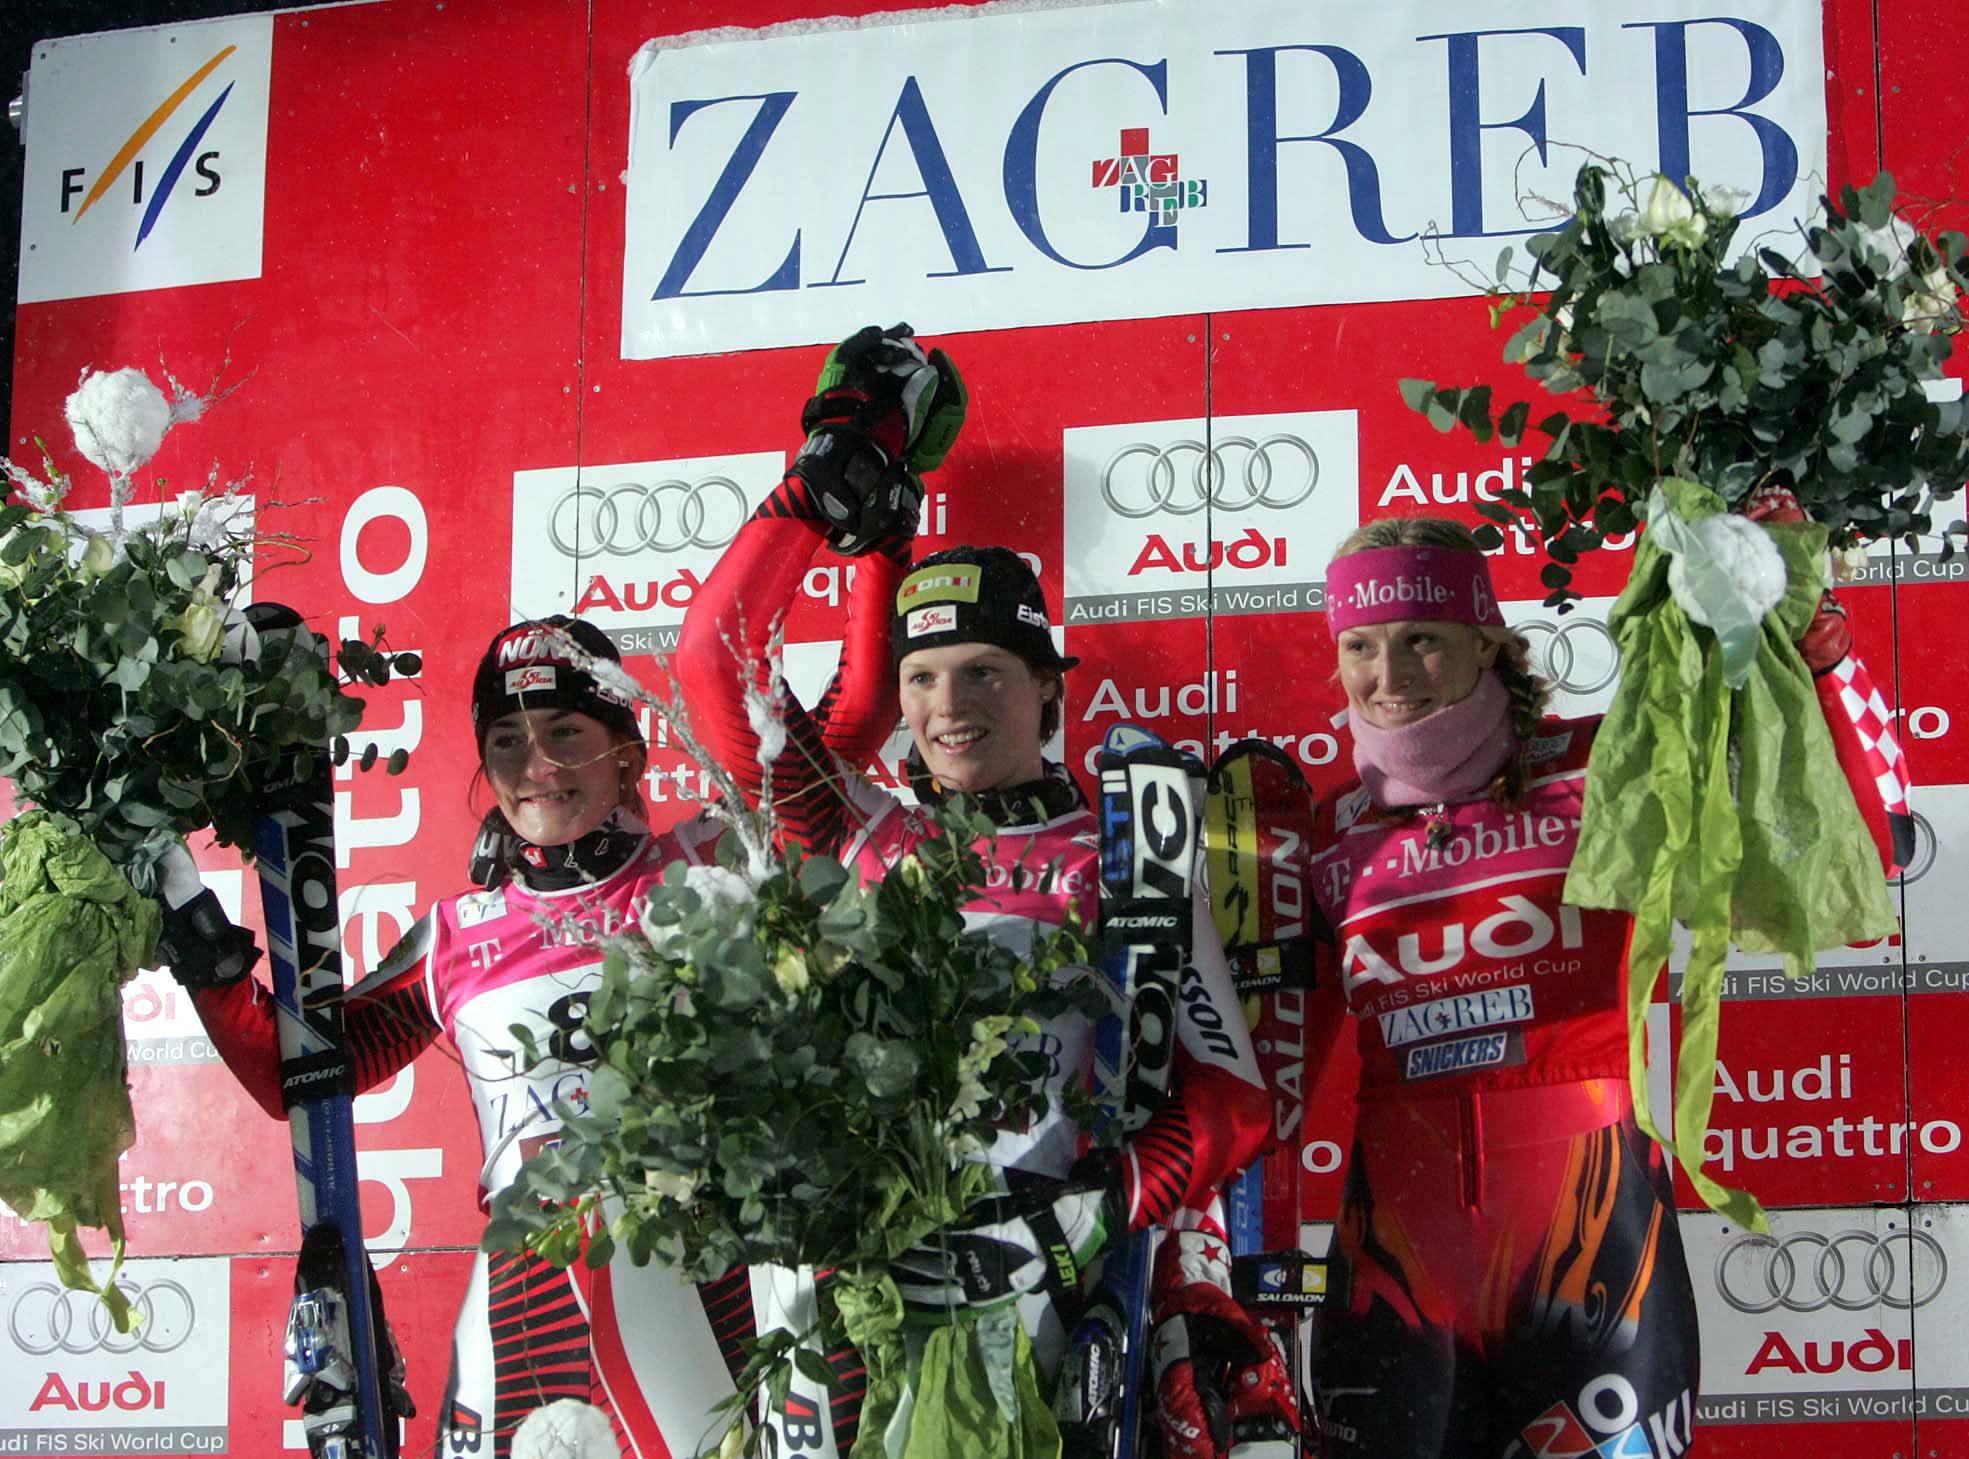 zagreb 050106 sljeme nocni slalom pobjednica schild marlies zettel kathrin i janica kostelic pobjednice foto tomislav serdar -spo- -desk-